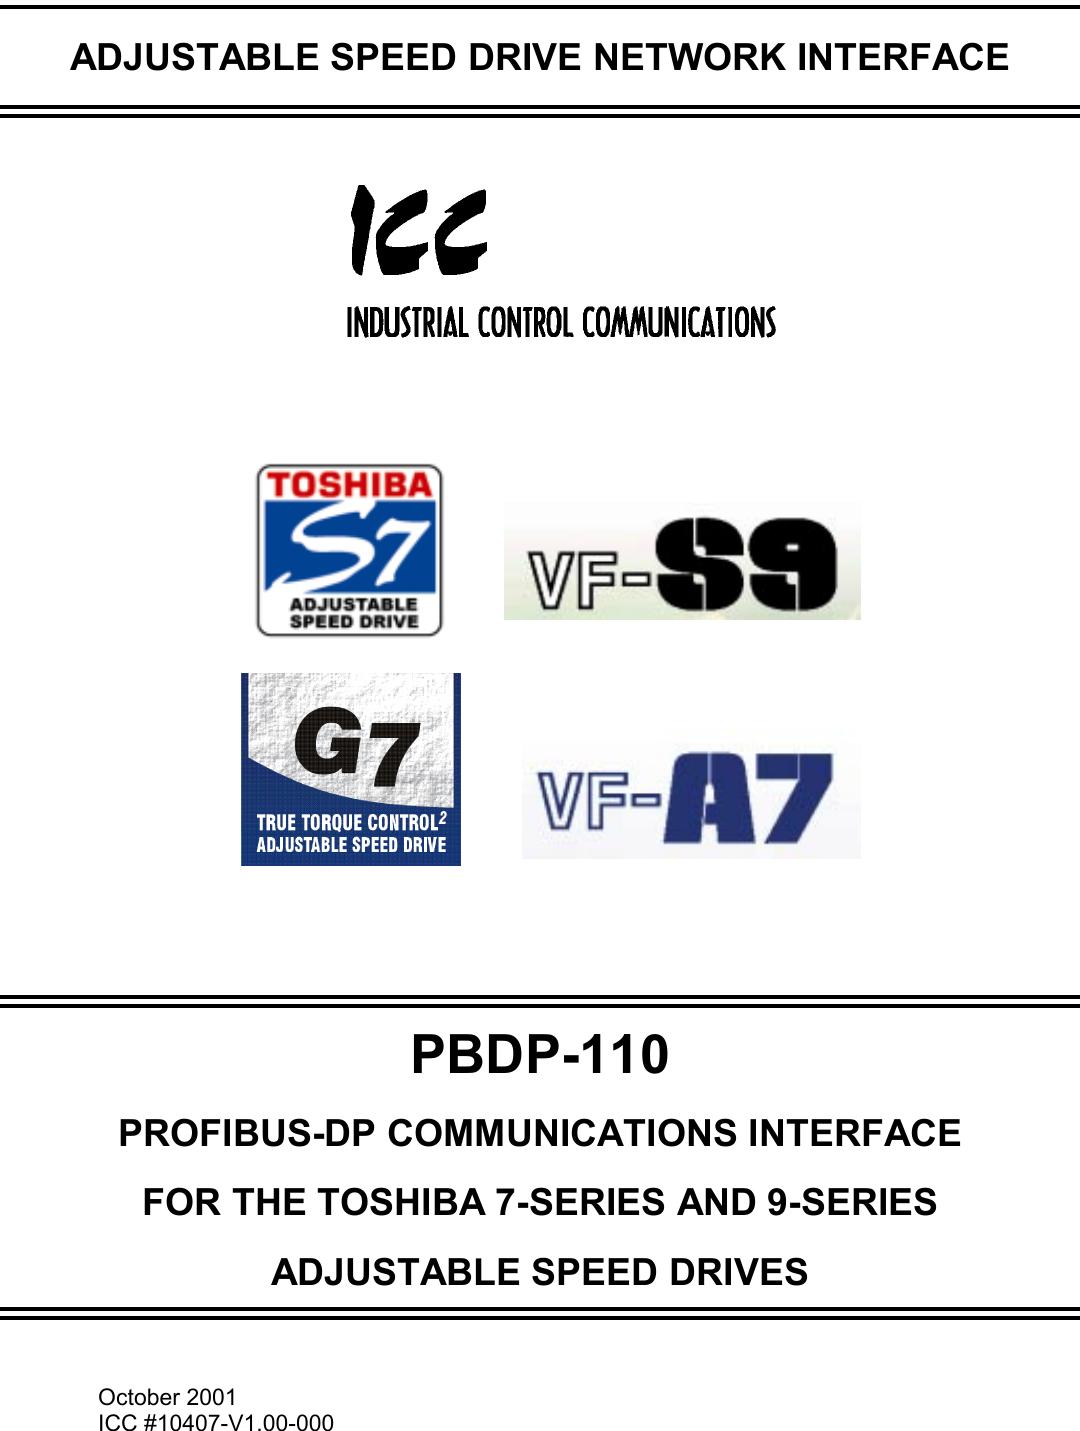 Toshiba G7 Wiring Diagram Explained Diagrams 1004flf3bshd Profibus Dp Pbdp 110 Users Manual Interface Split Ac System